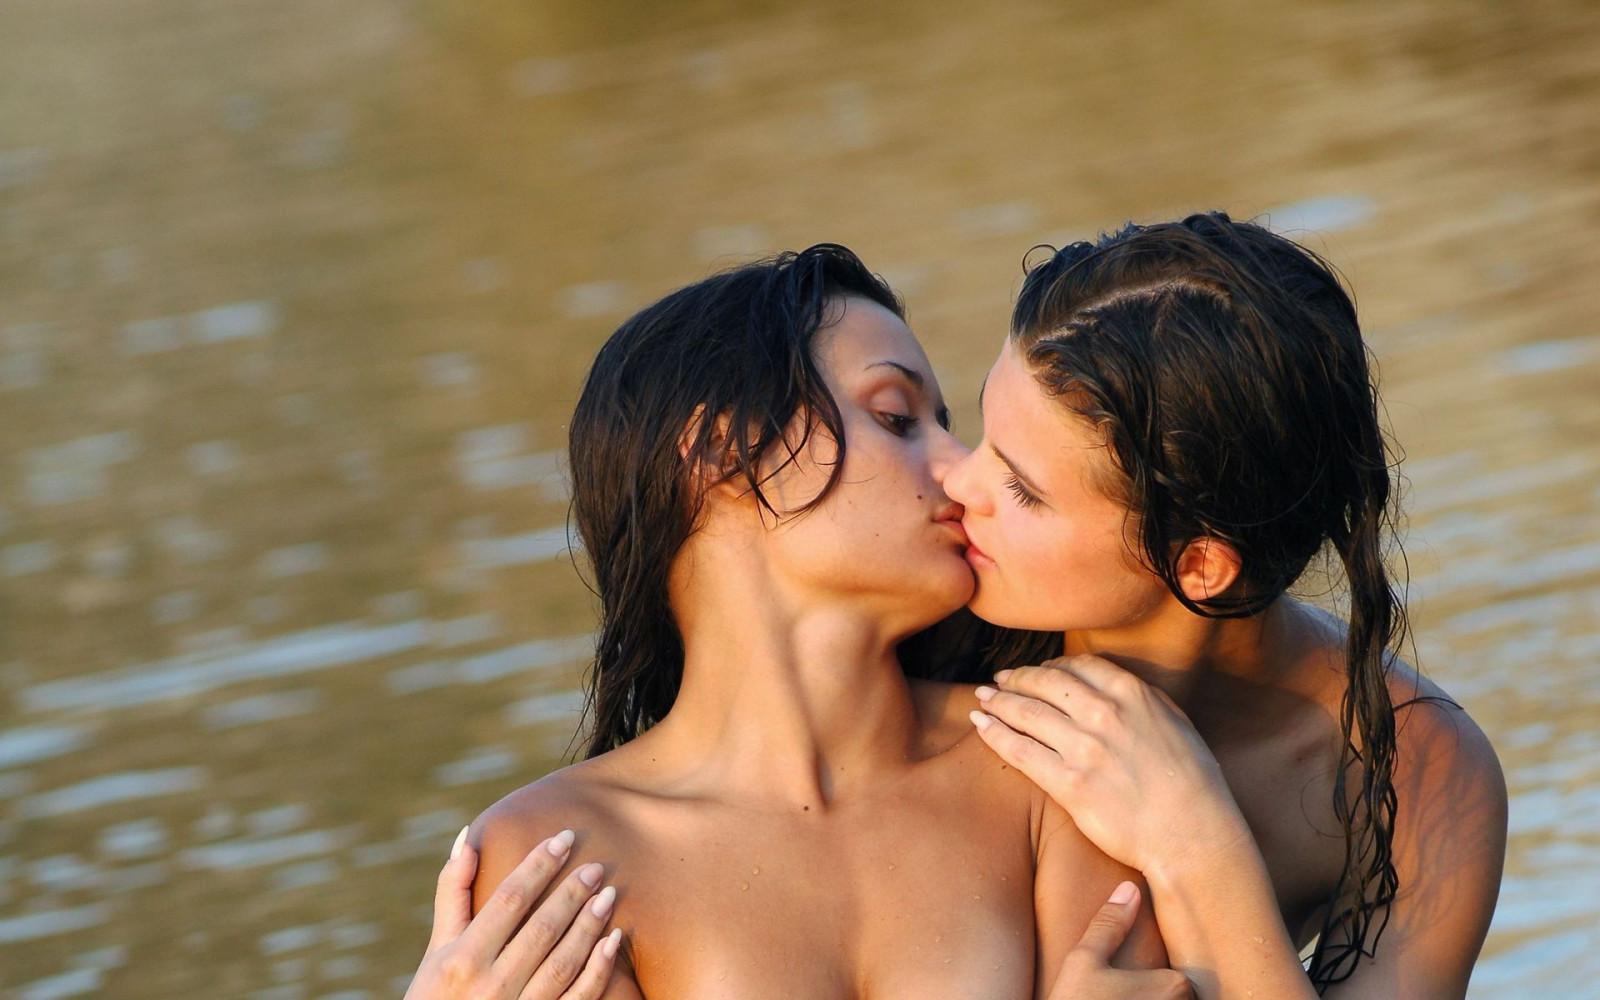 Hot Lesbian Photos